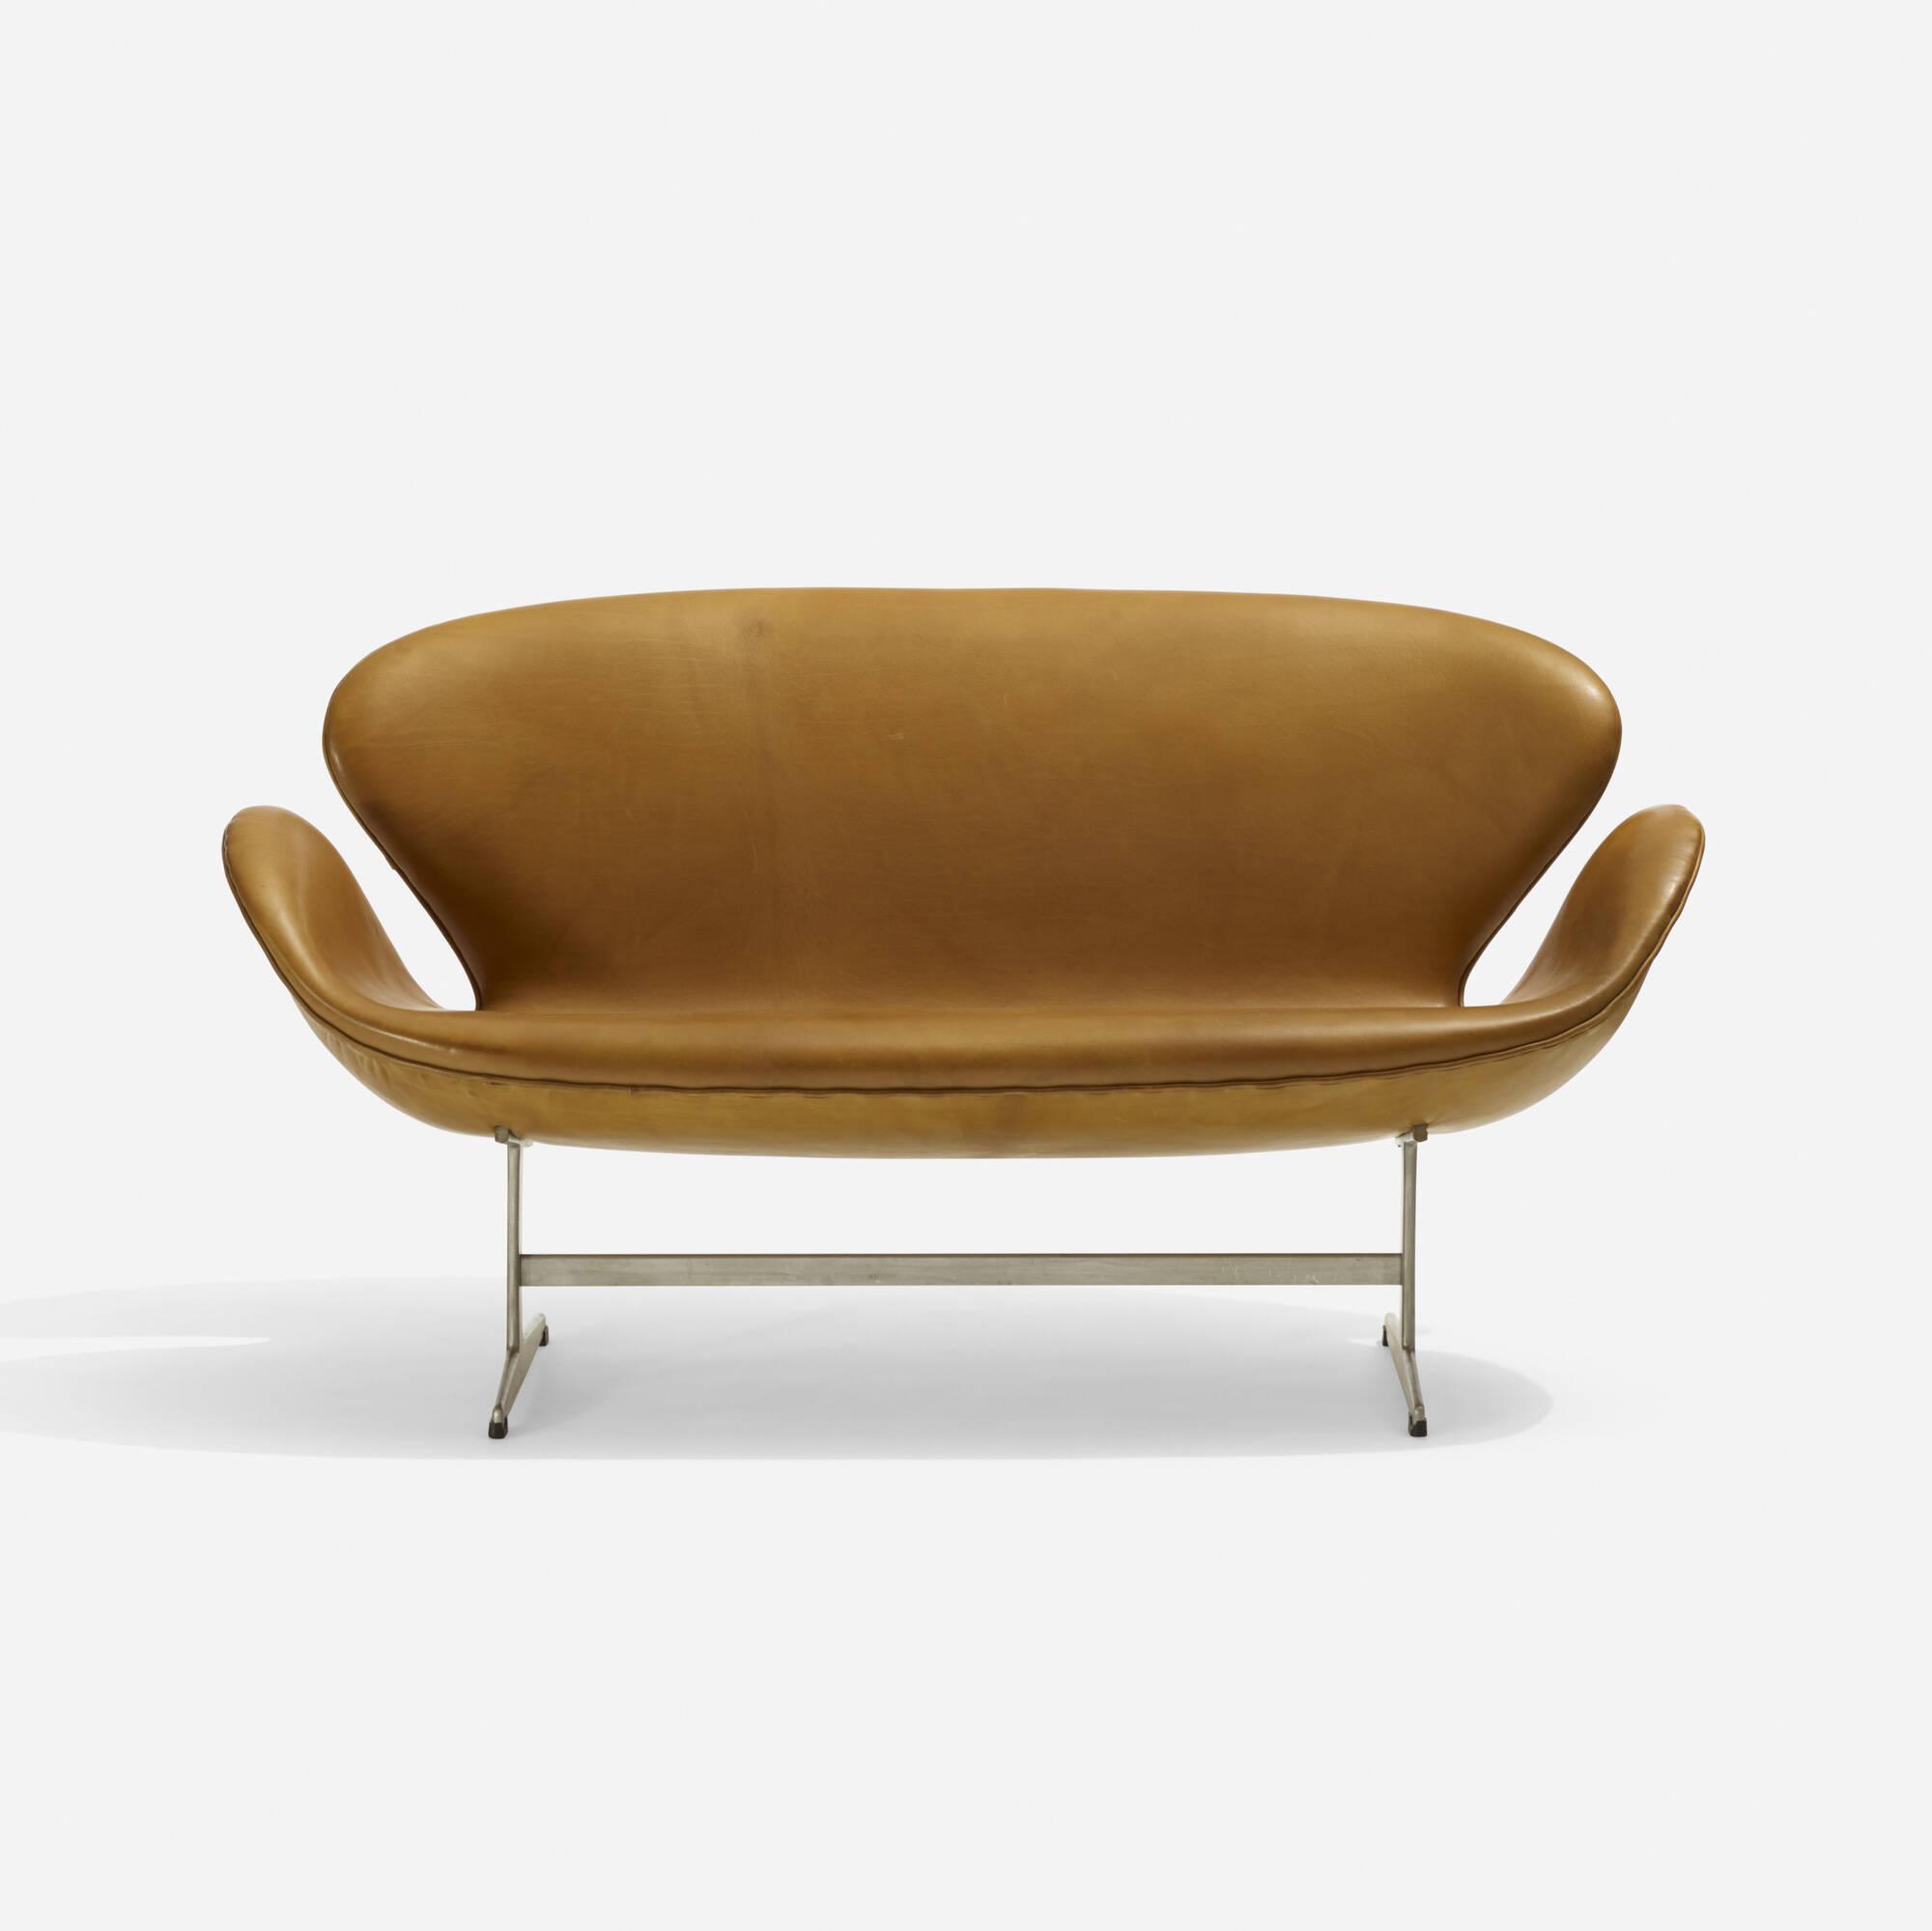 106: Arne Jacobsen / Swan settee, model 3321 (1 of 5)